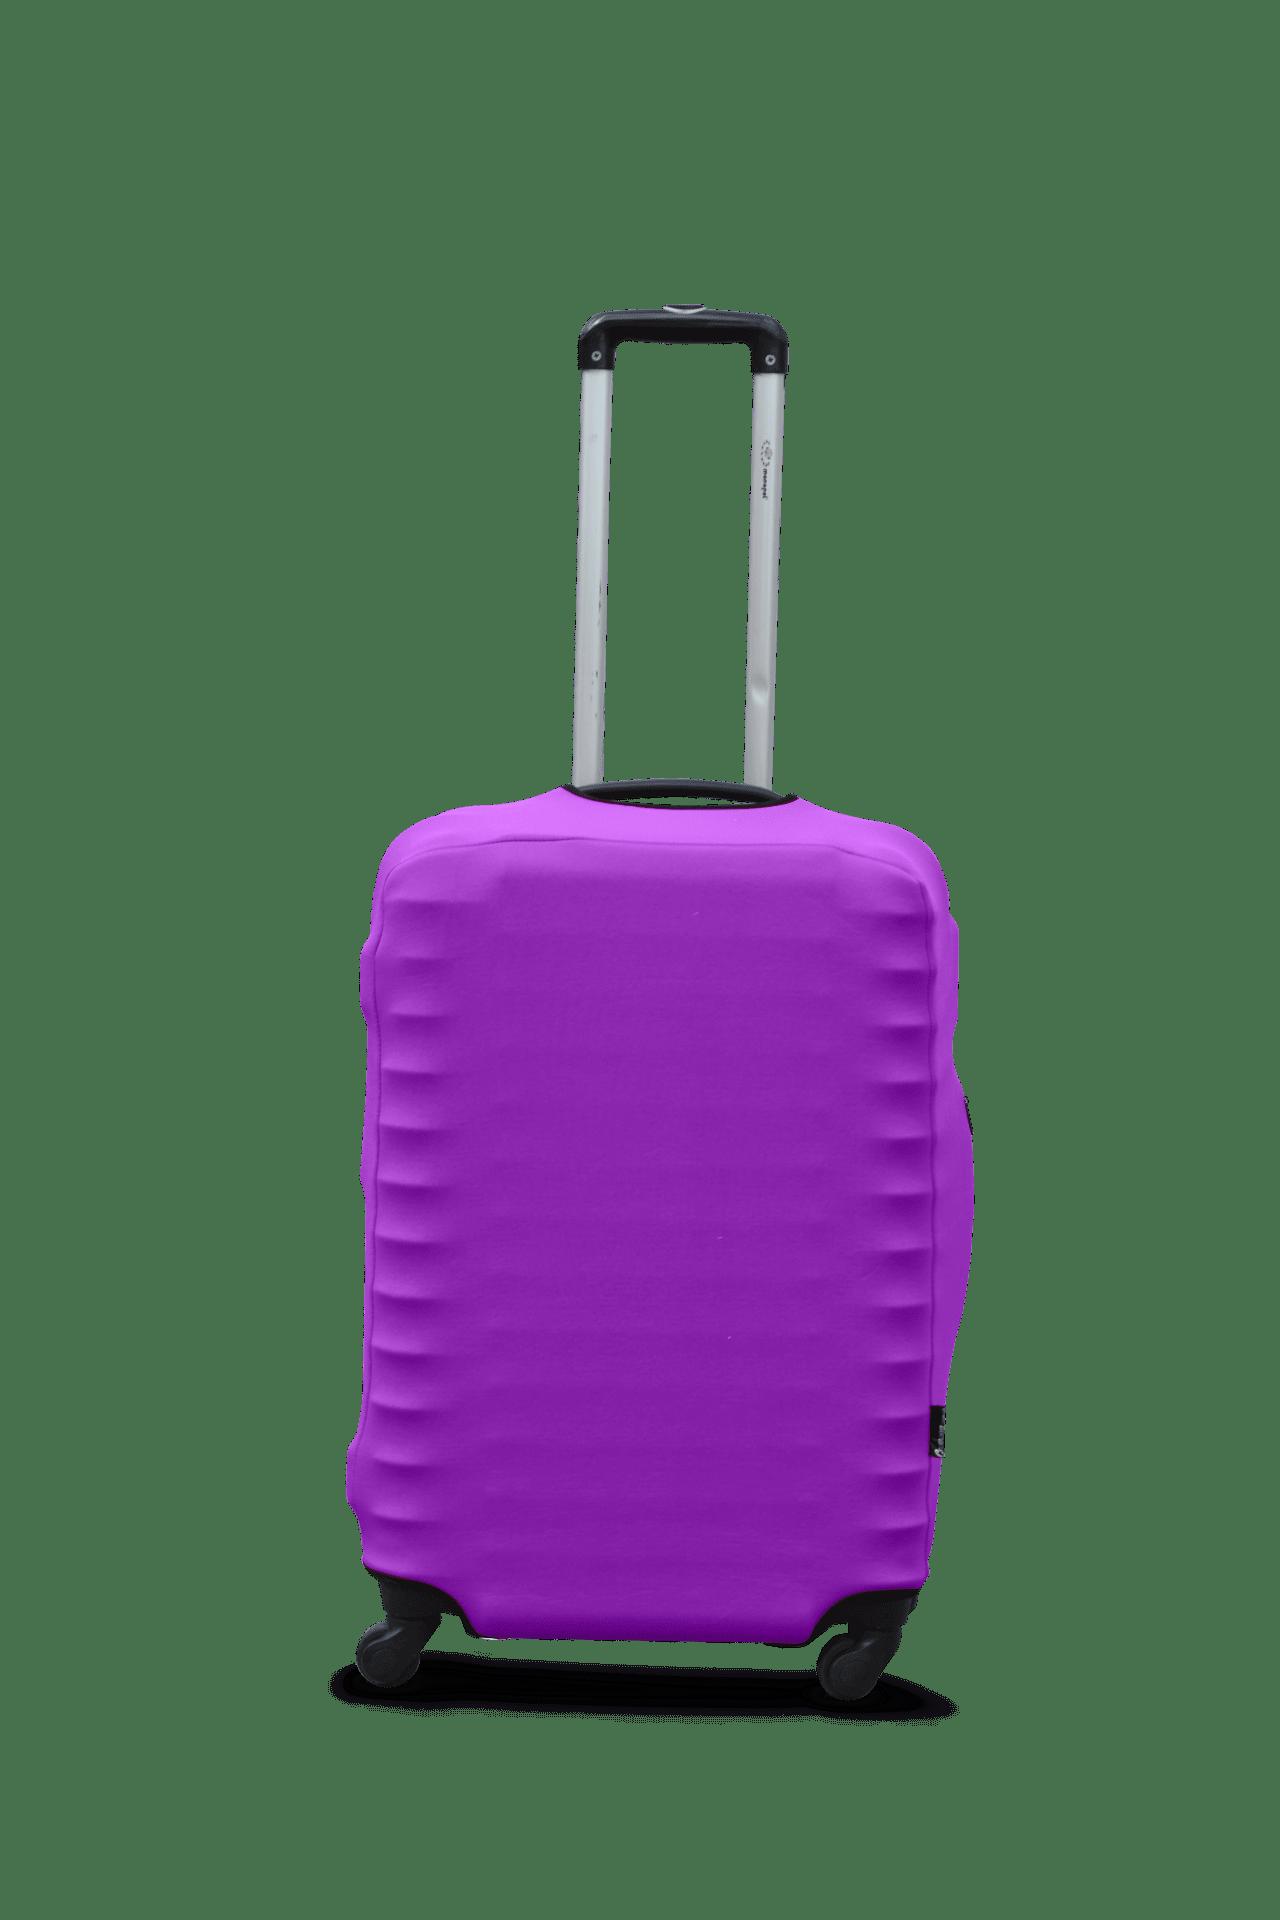 Husa pentru valiza daiving Cover DAWING S PURPLE